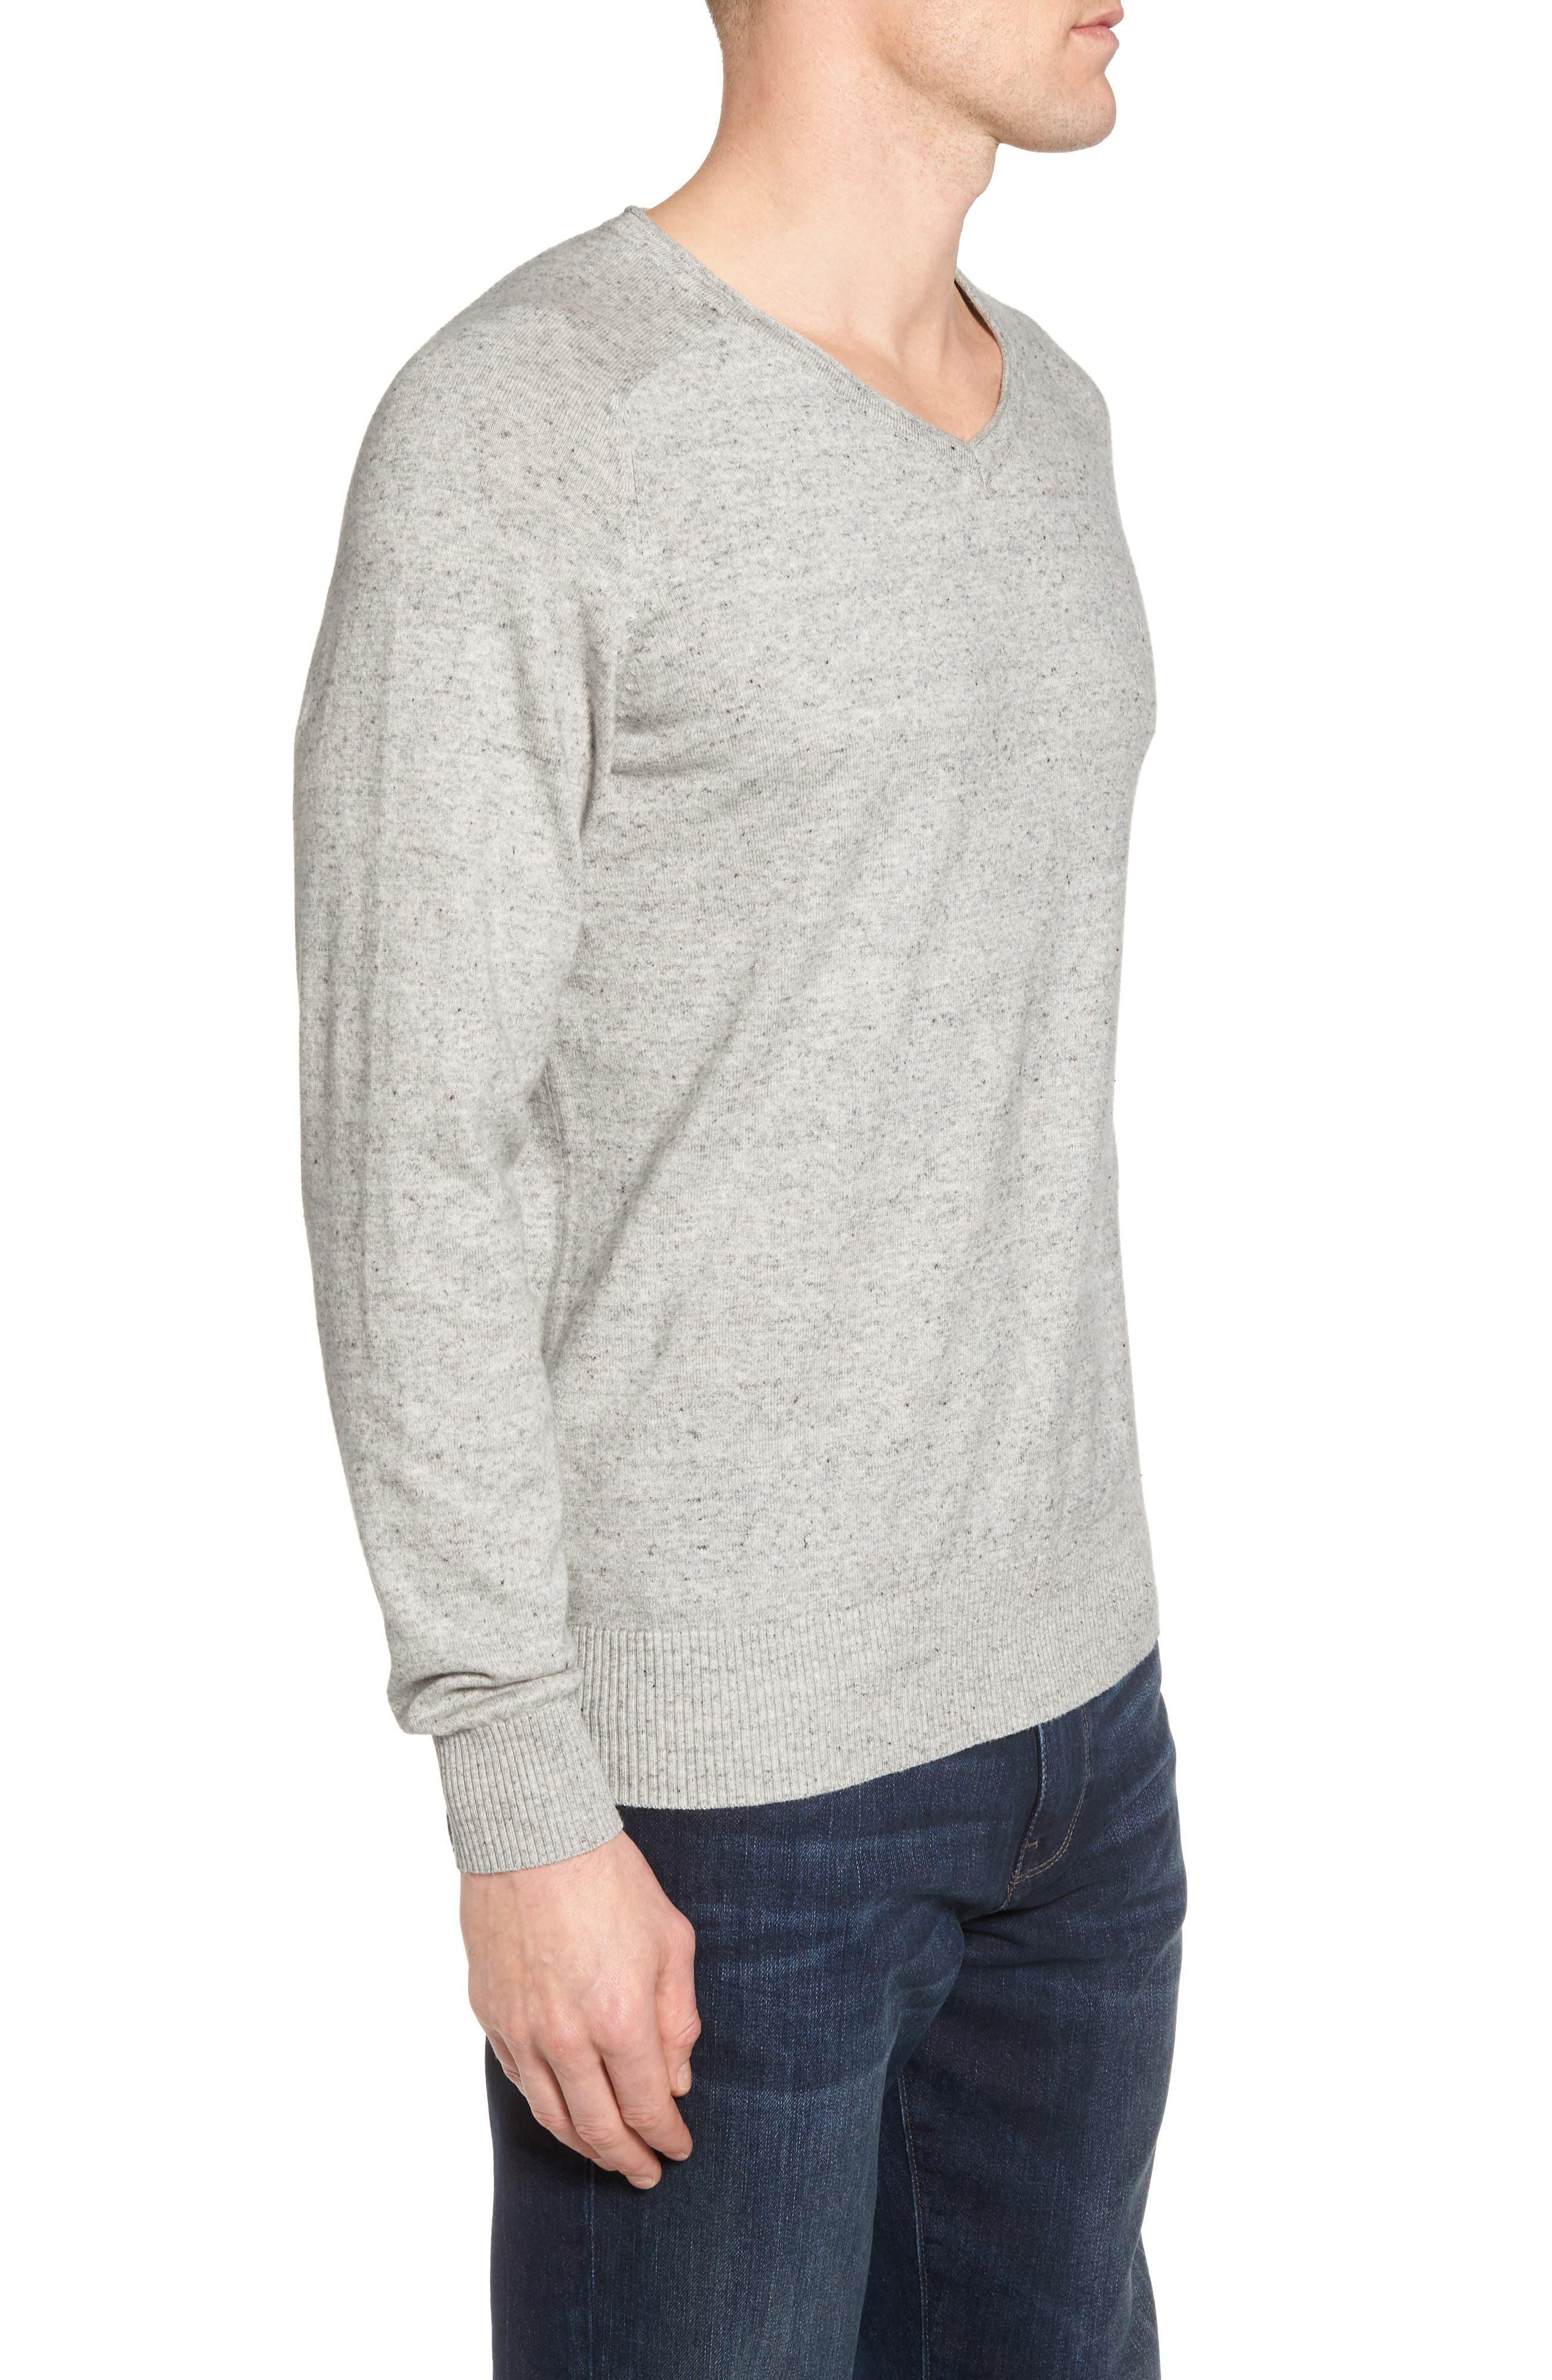 Arbors Cotton V-Neck Sweater,                             Alternate thumbnail 3, color,                             Oatmeal